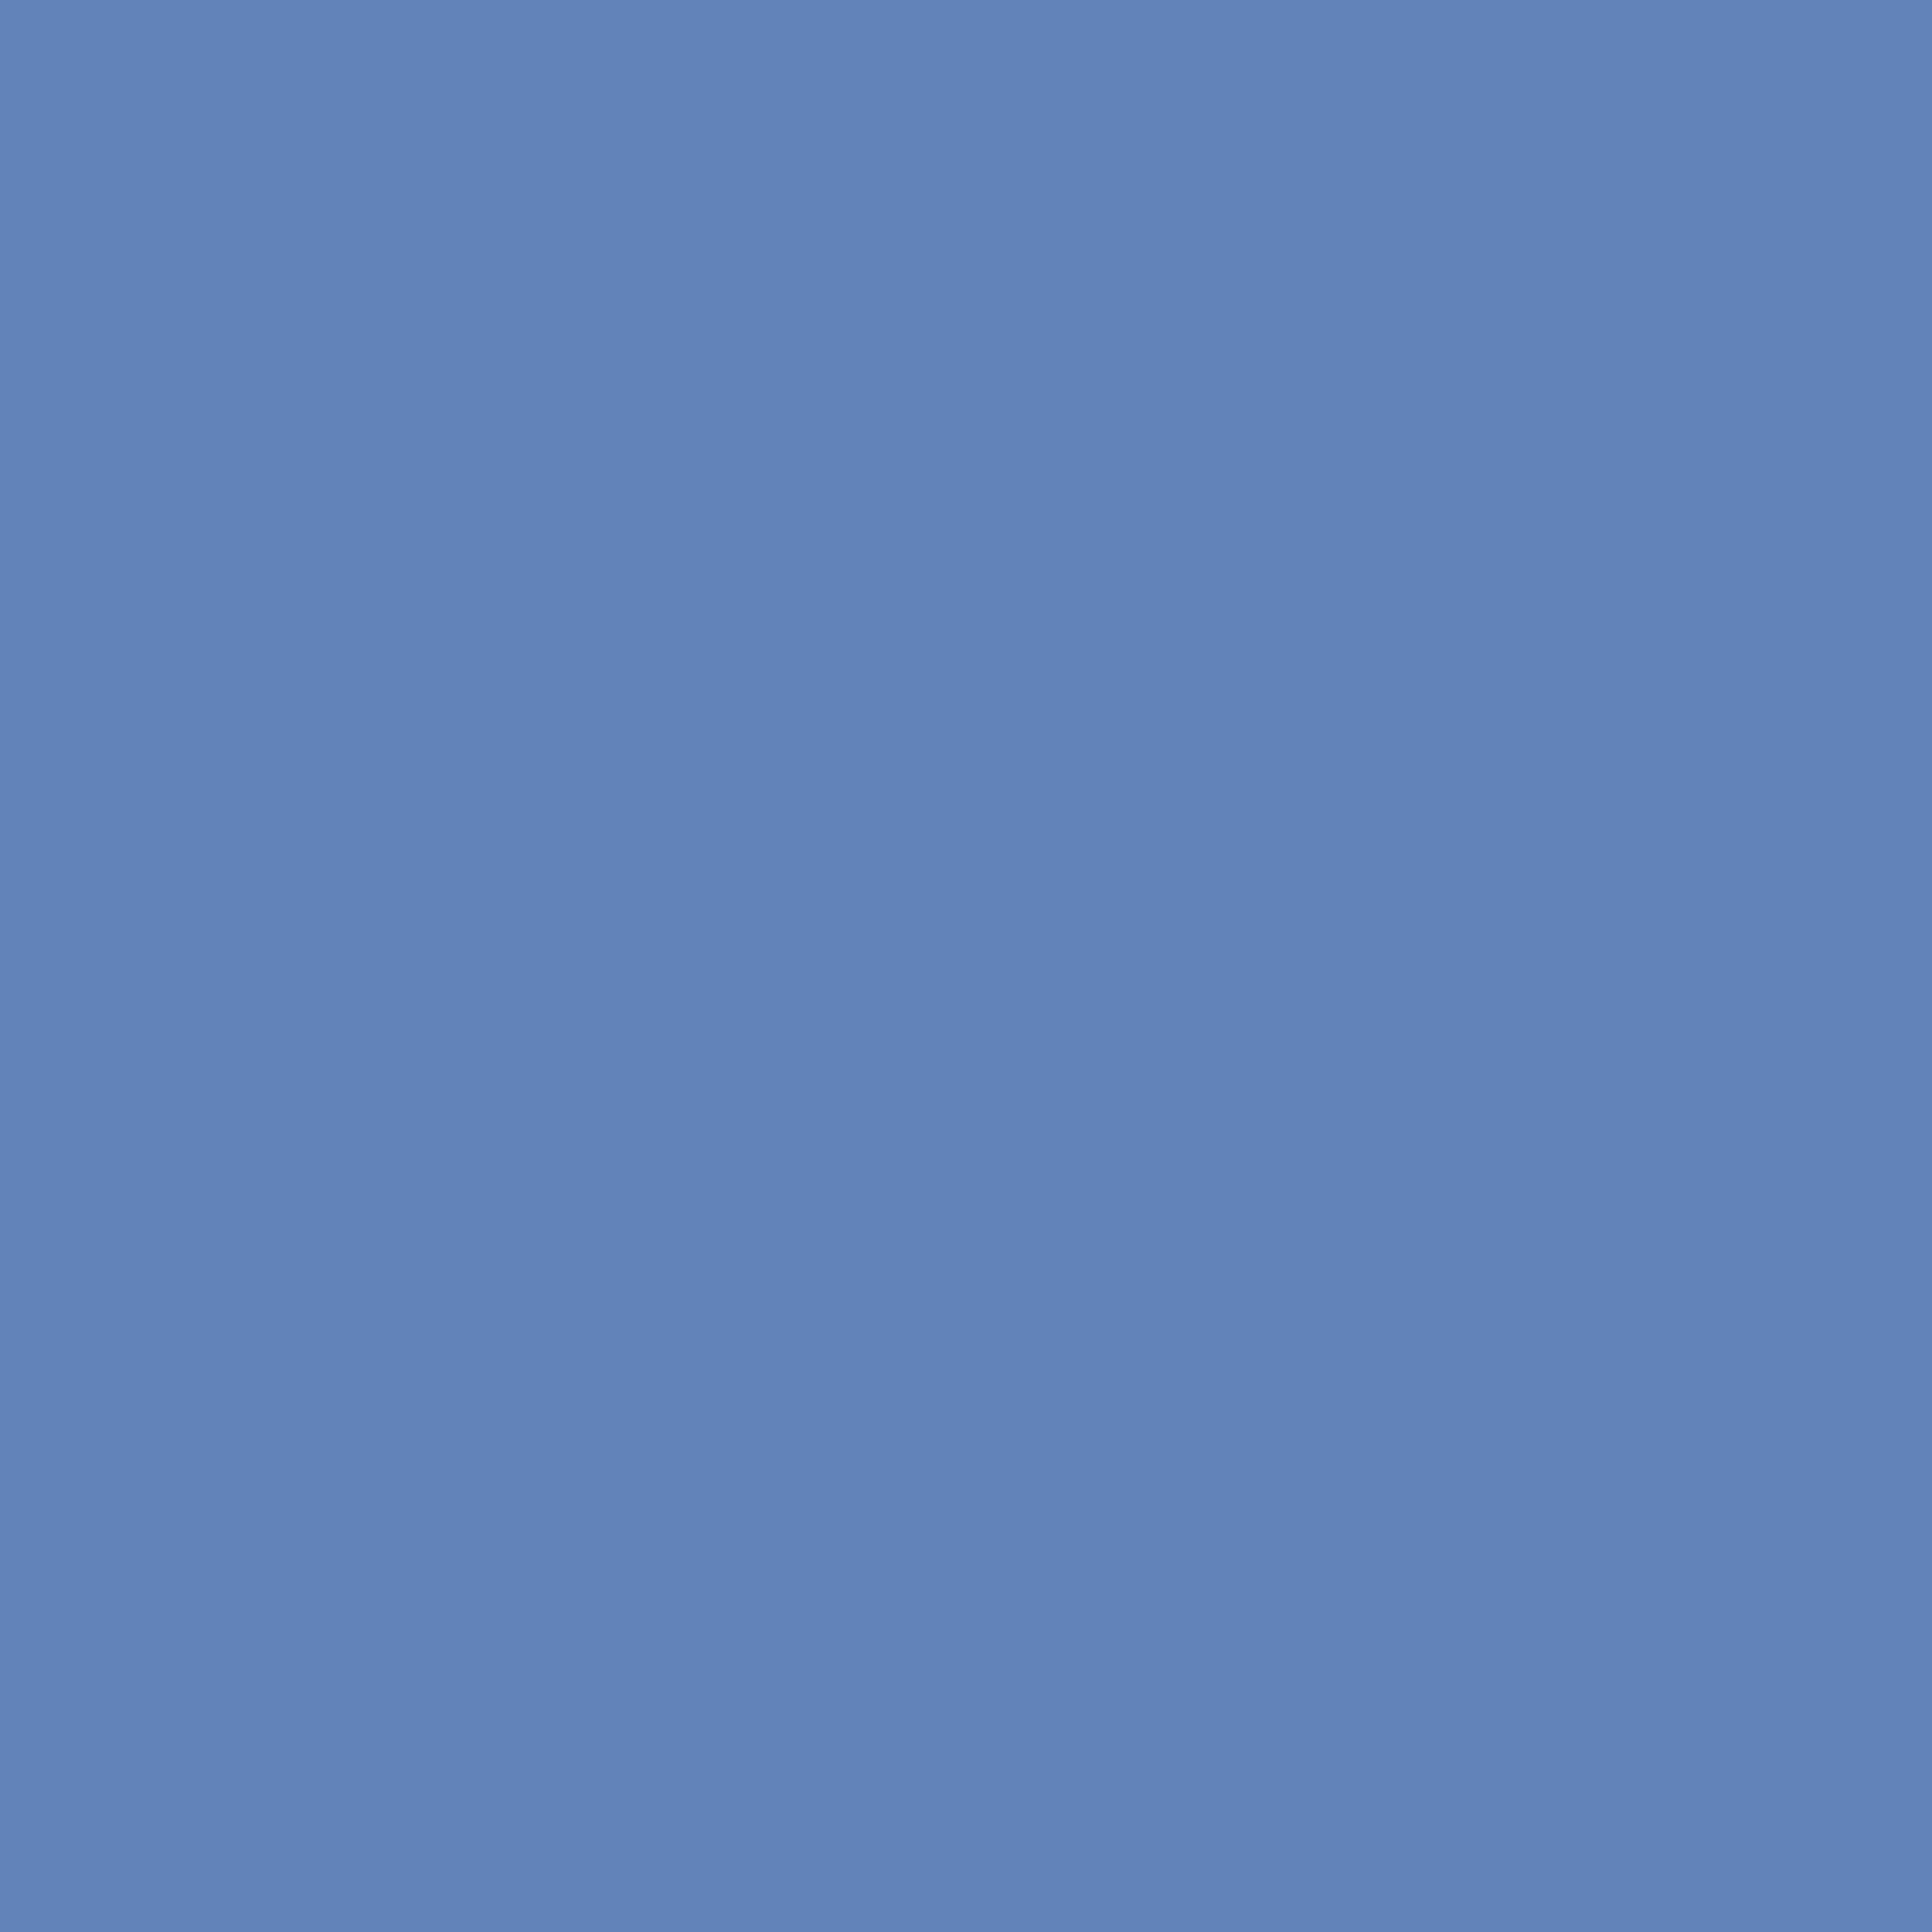 2048x2048 Glaucous Solid Color Background